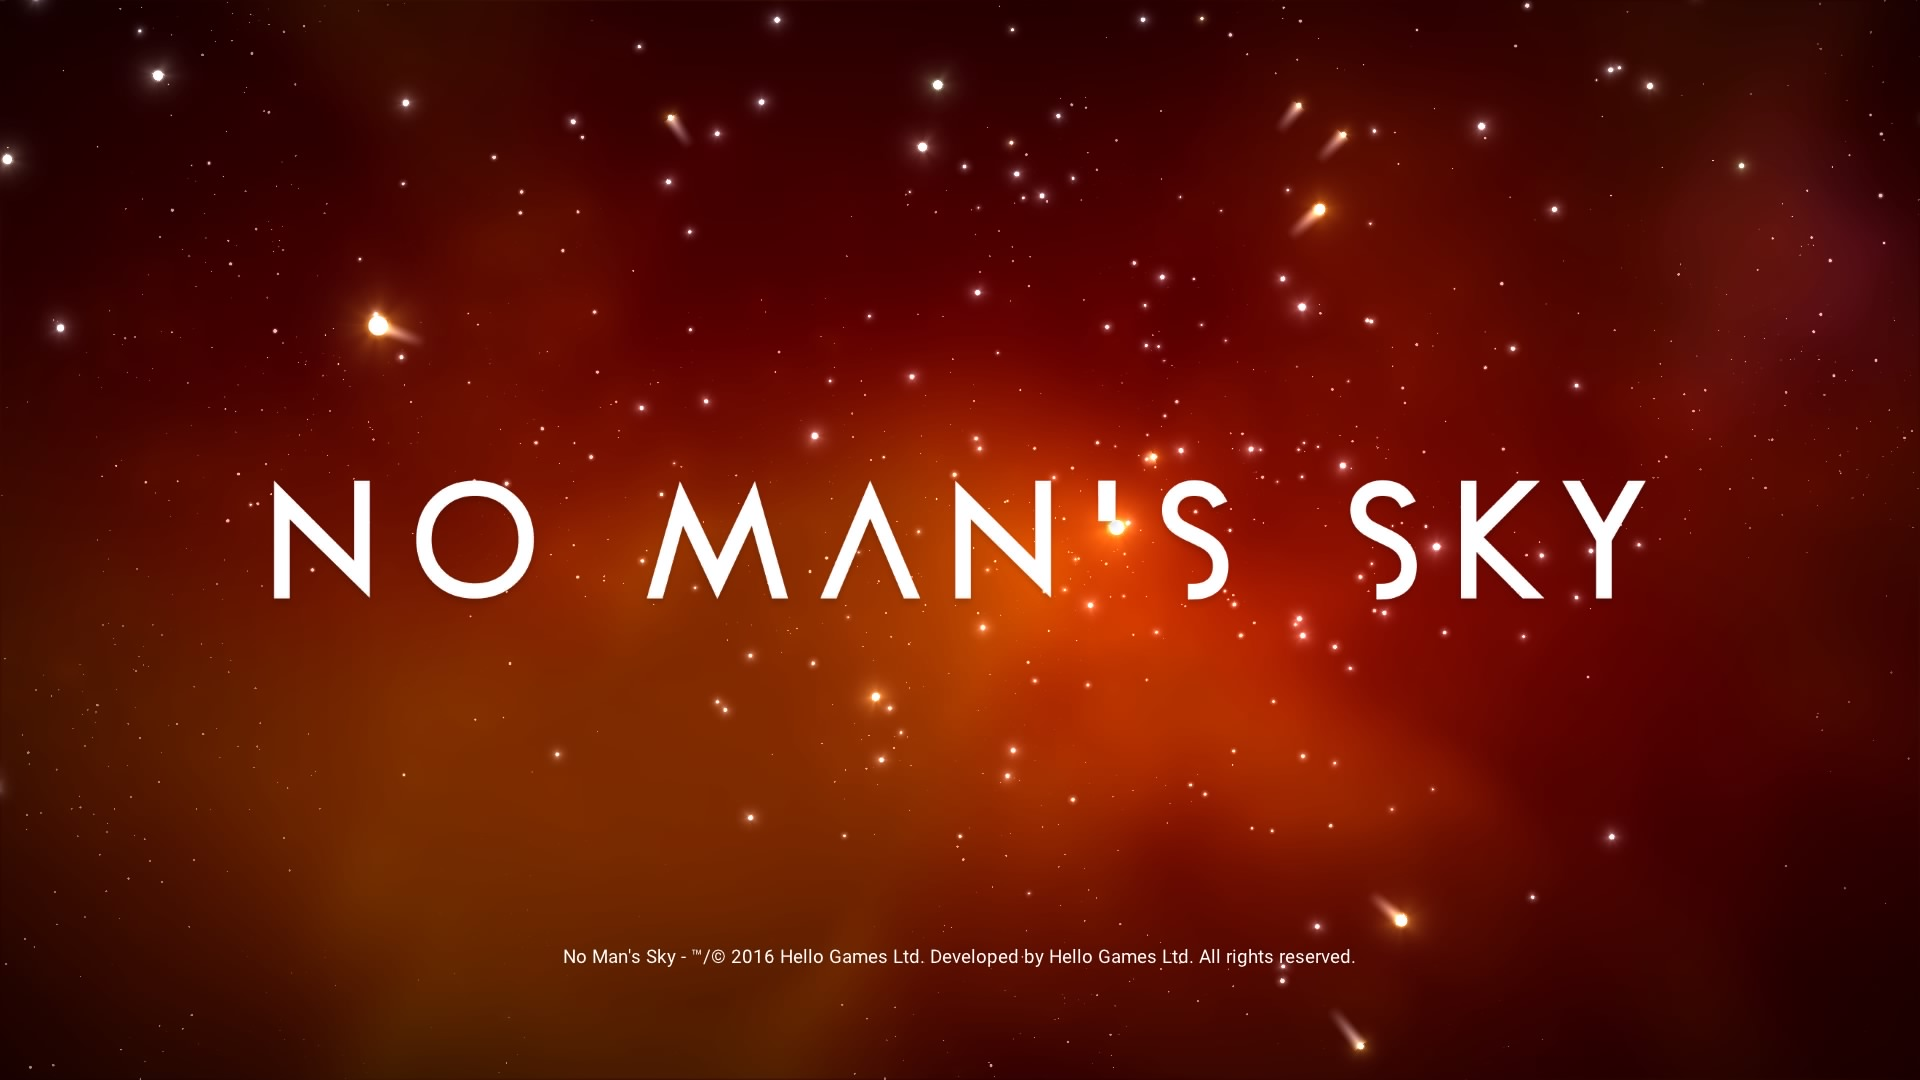 No Man's Sky: First Impressions